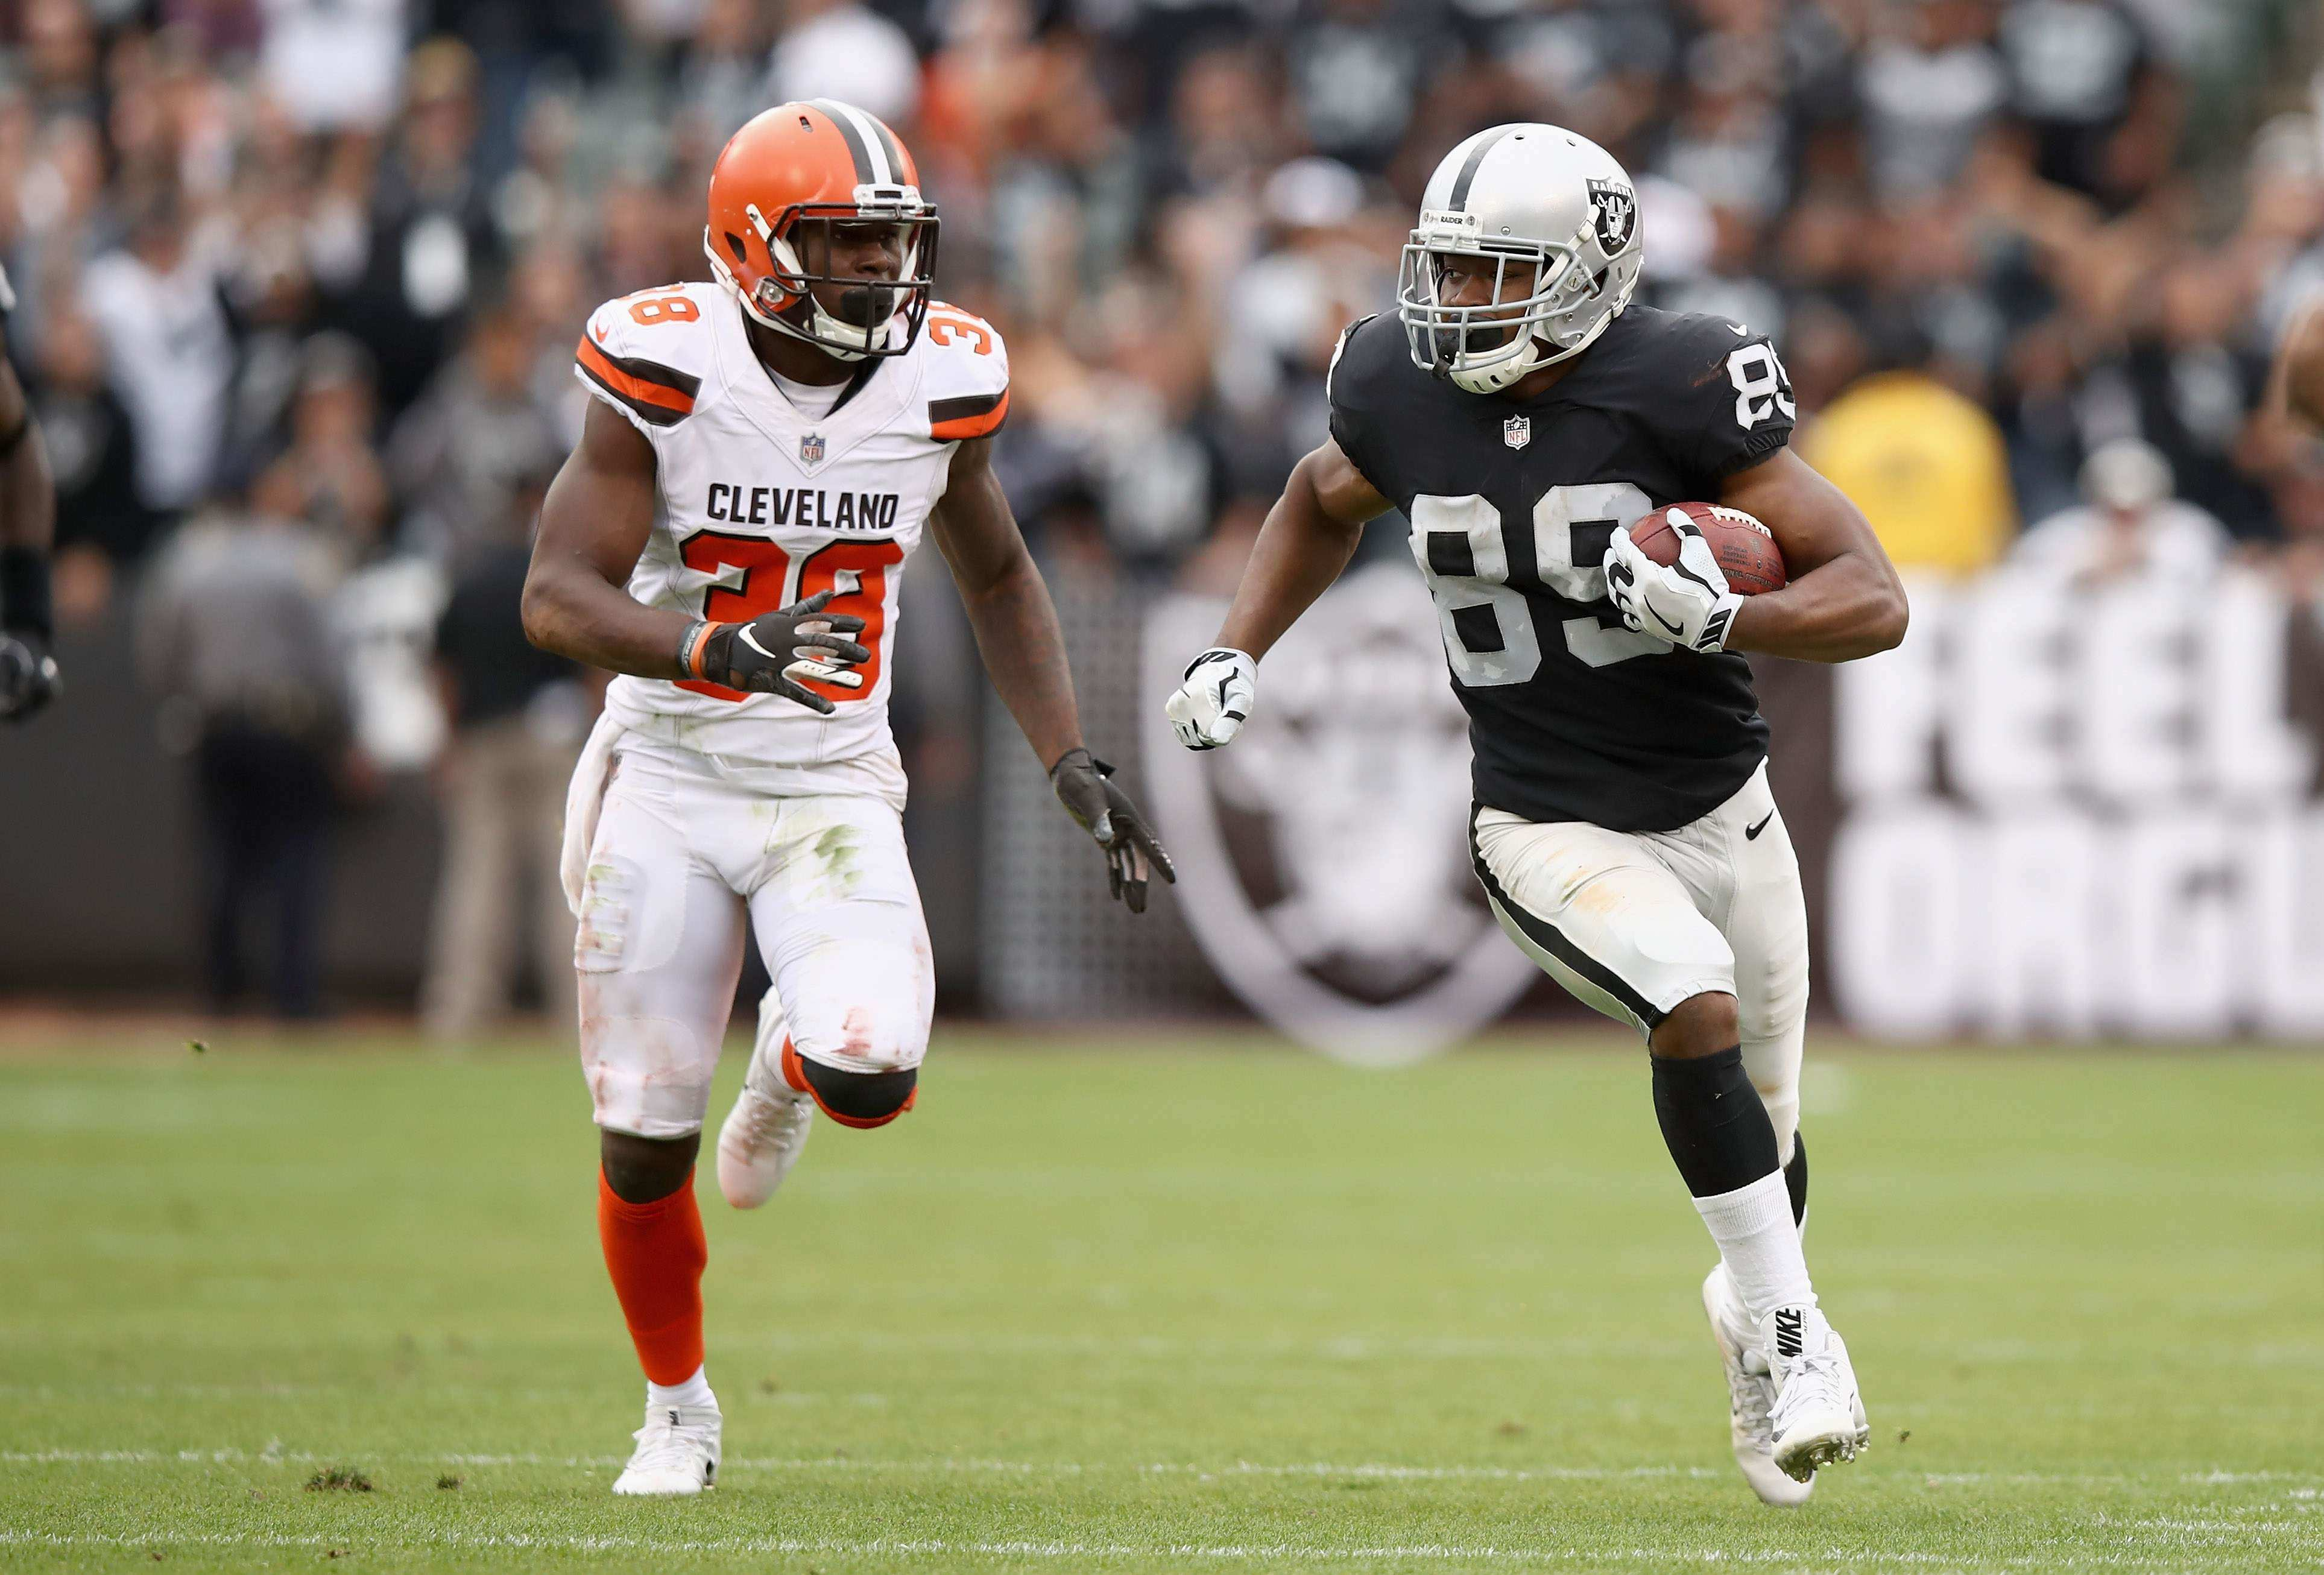 Oakland Raiders' Wide Receiver Amari Cooper On the Trade Block